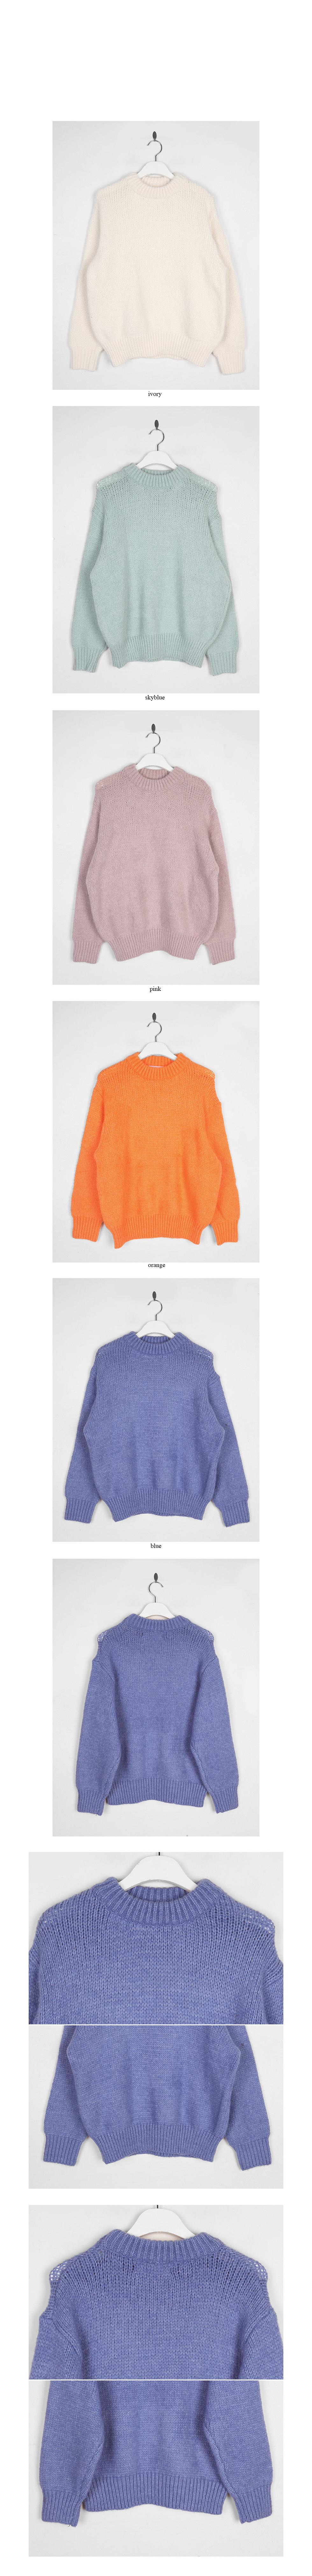 vivid color oversized knit